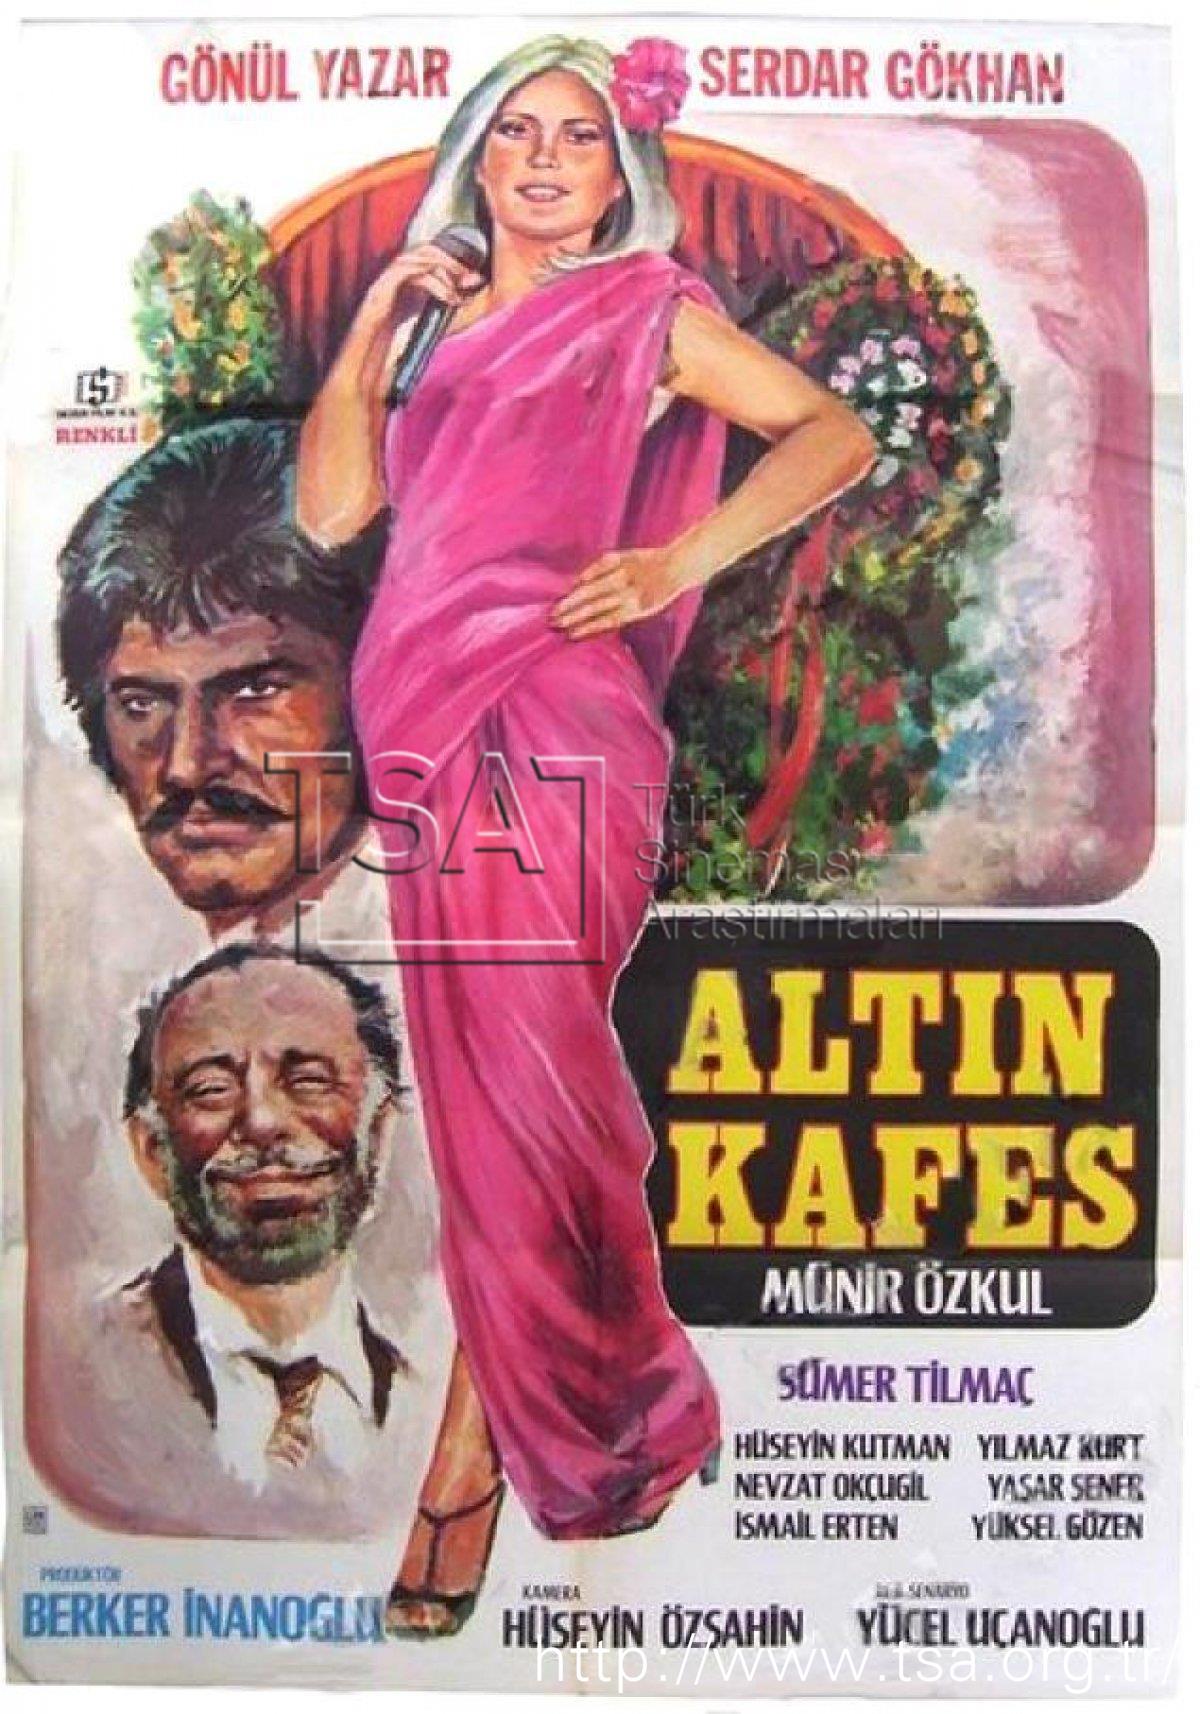 Altin kafes ((1982))